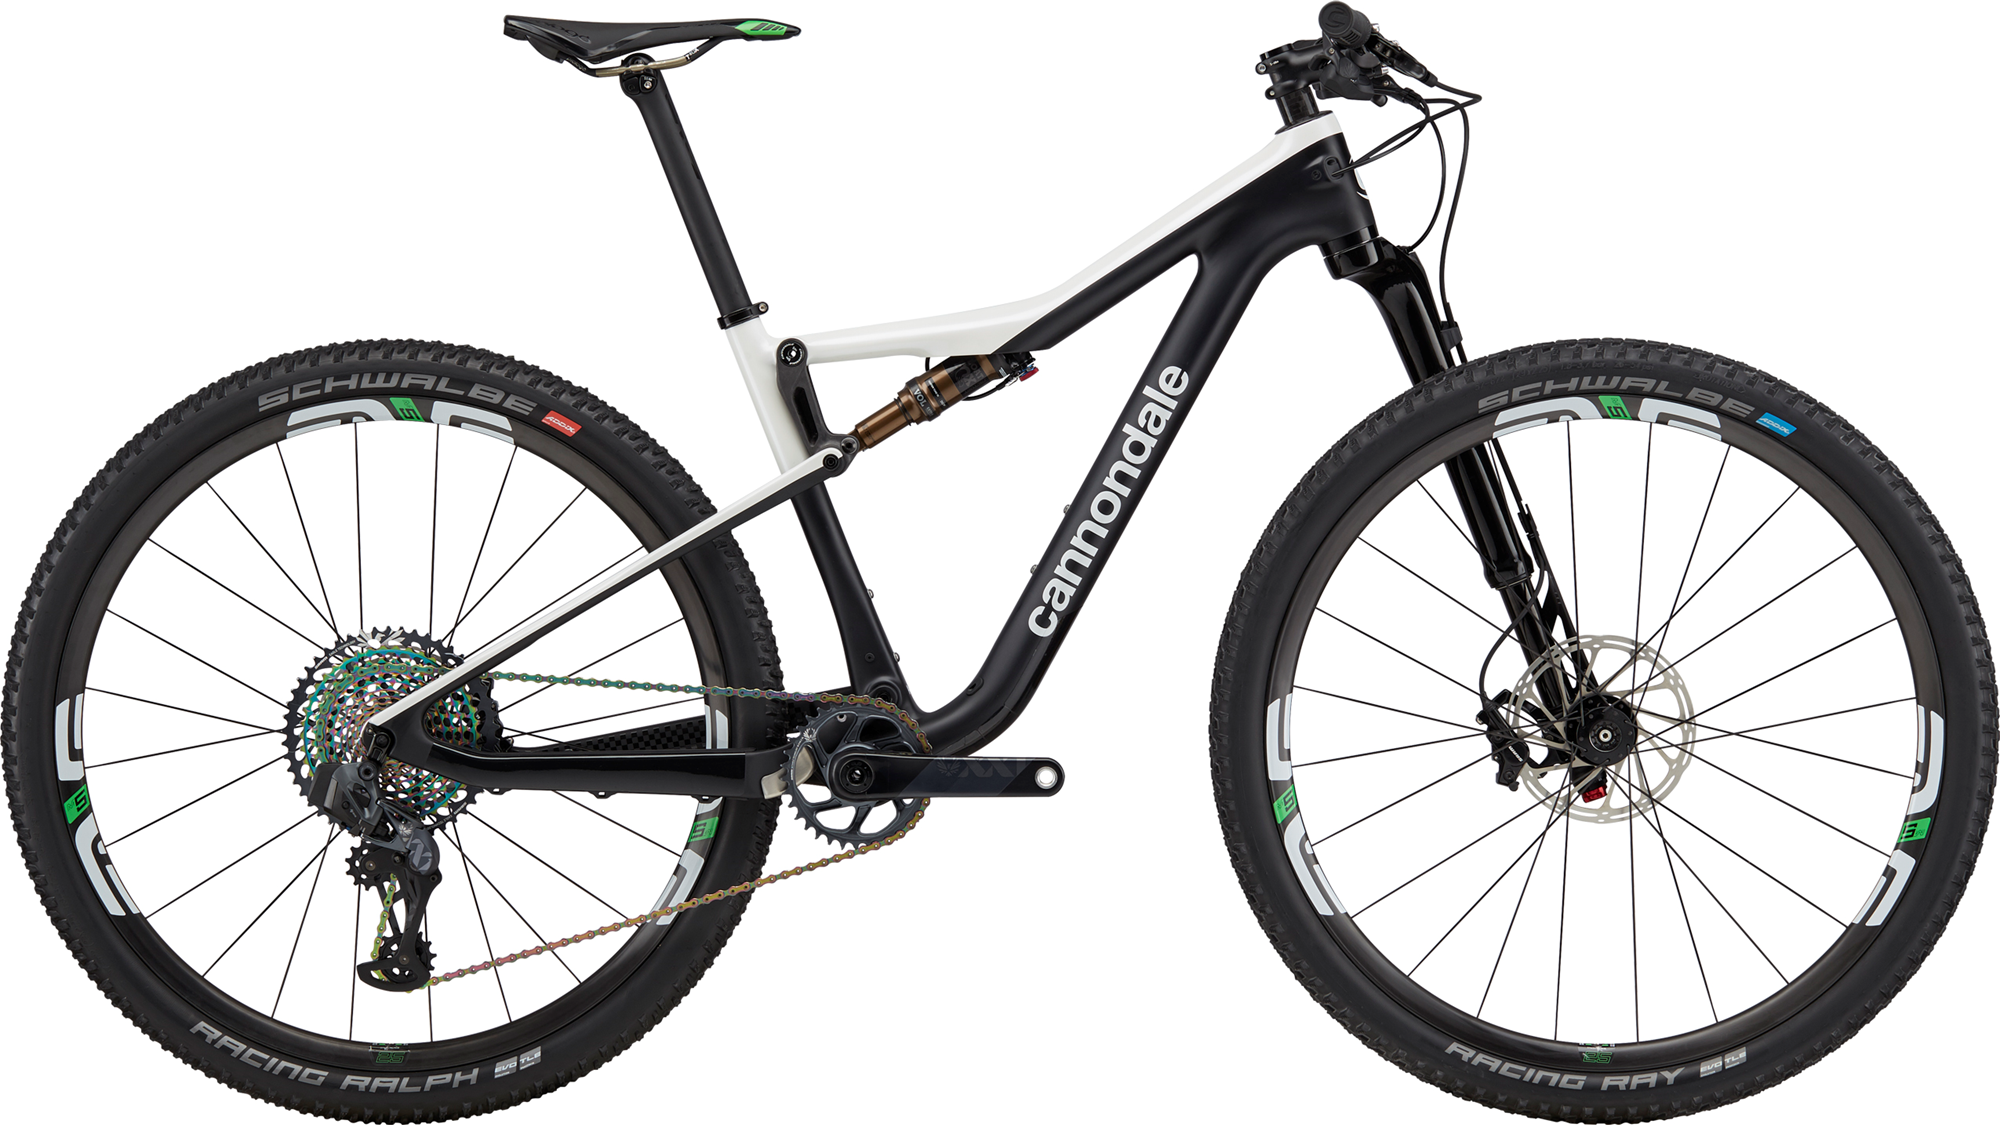 Cannondale Scalpel Si Hi Mod XX1 AXS World Cup Replica Bike 2020 Black